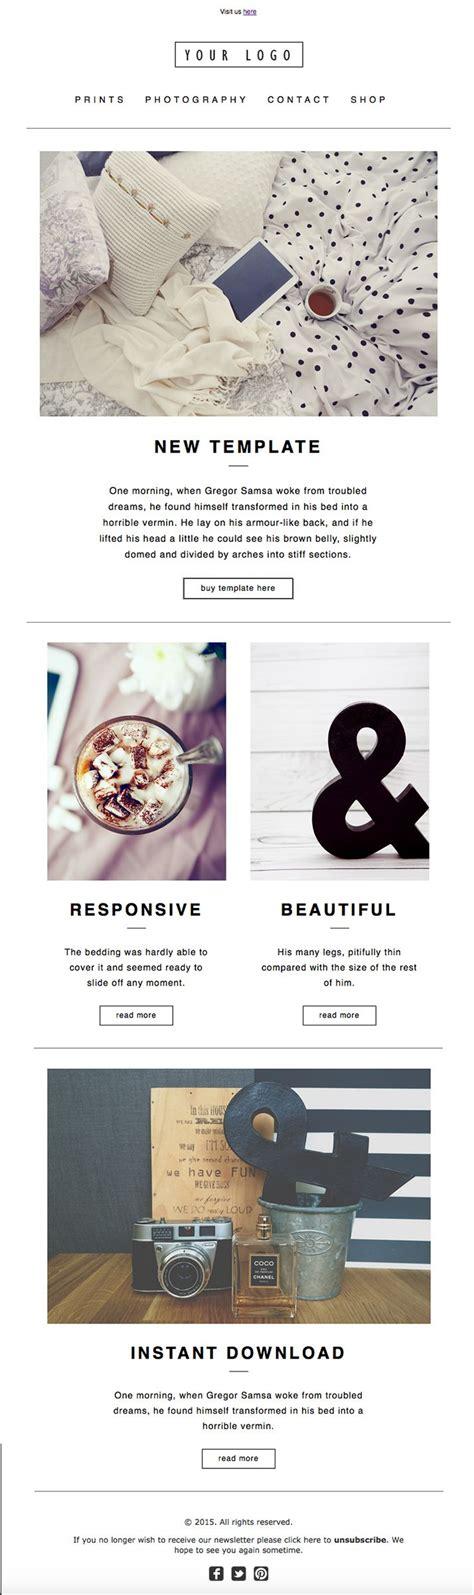 newsletter layout pinterest best 25 online newsletter ideas on pinterest online